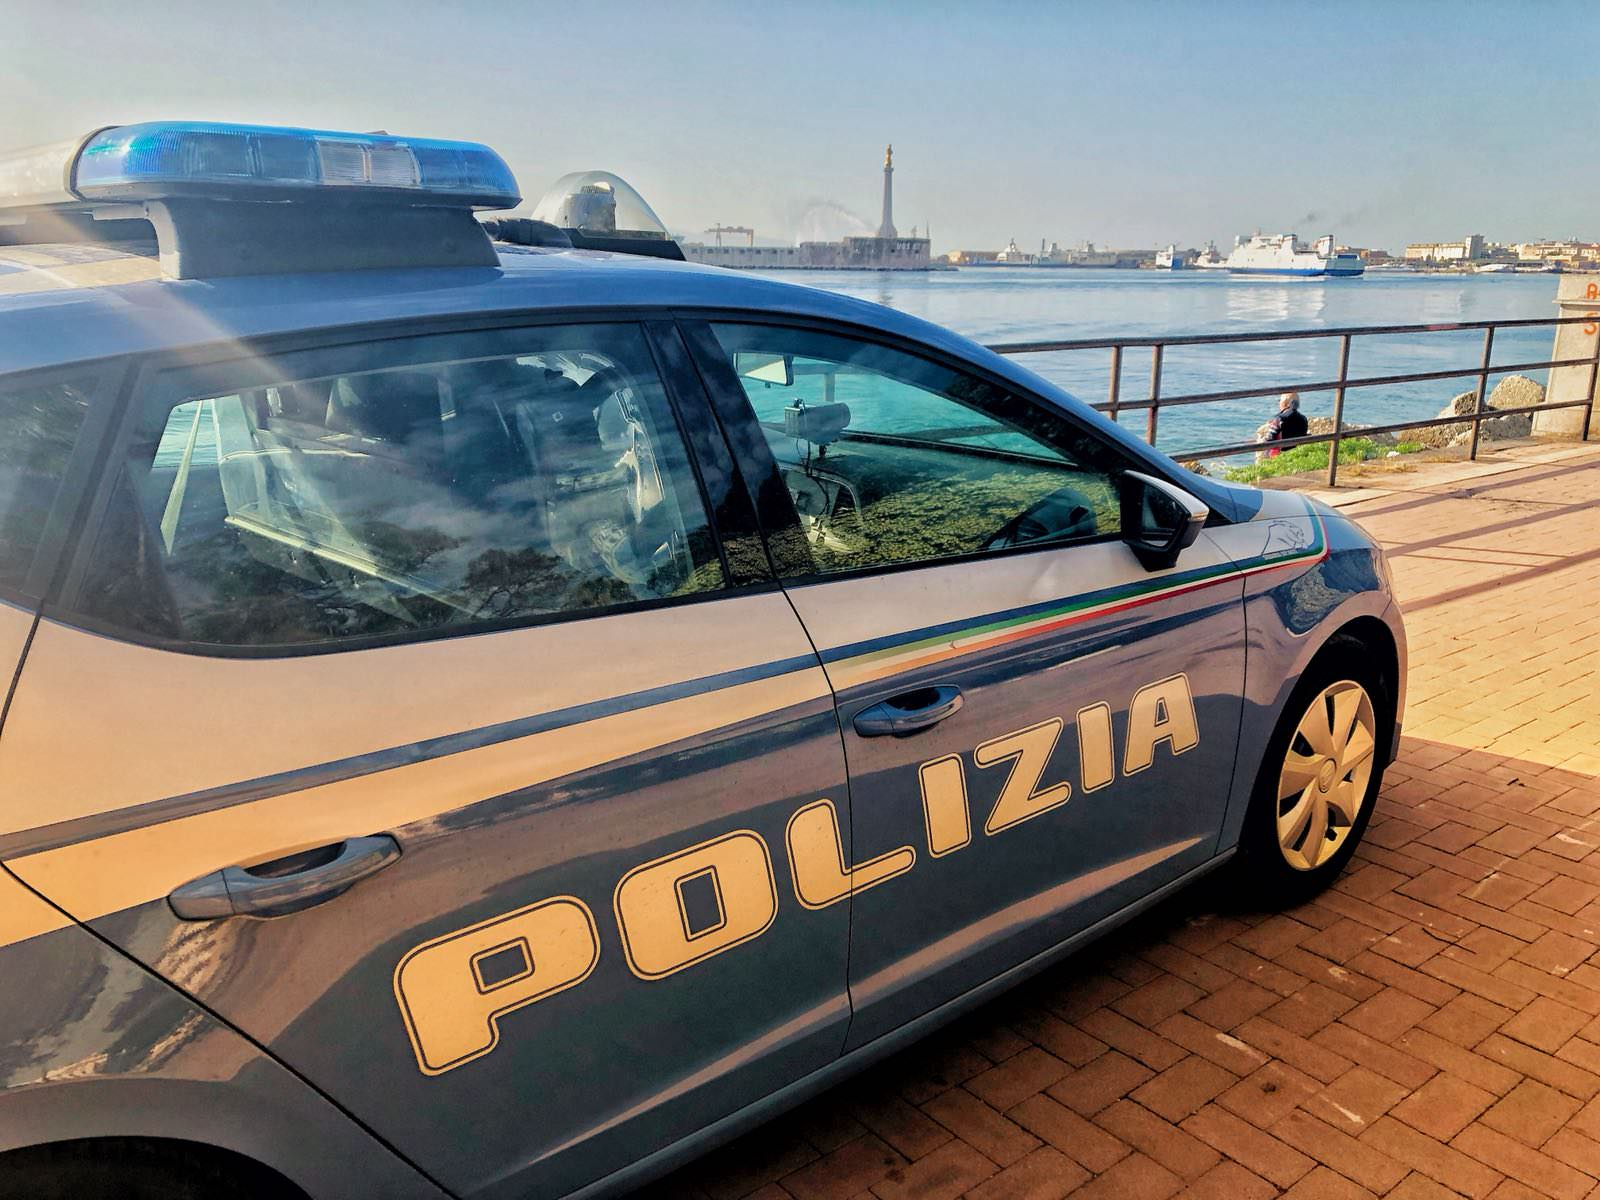 Succede a Messina e provincia: 15 ottobre MATTINA